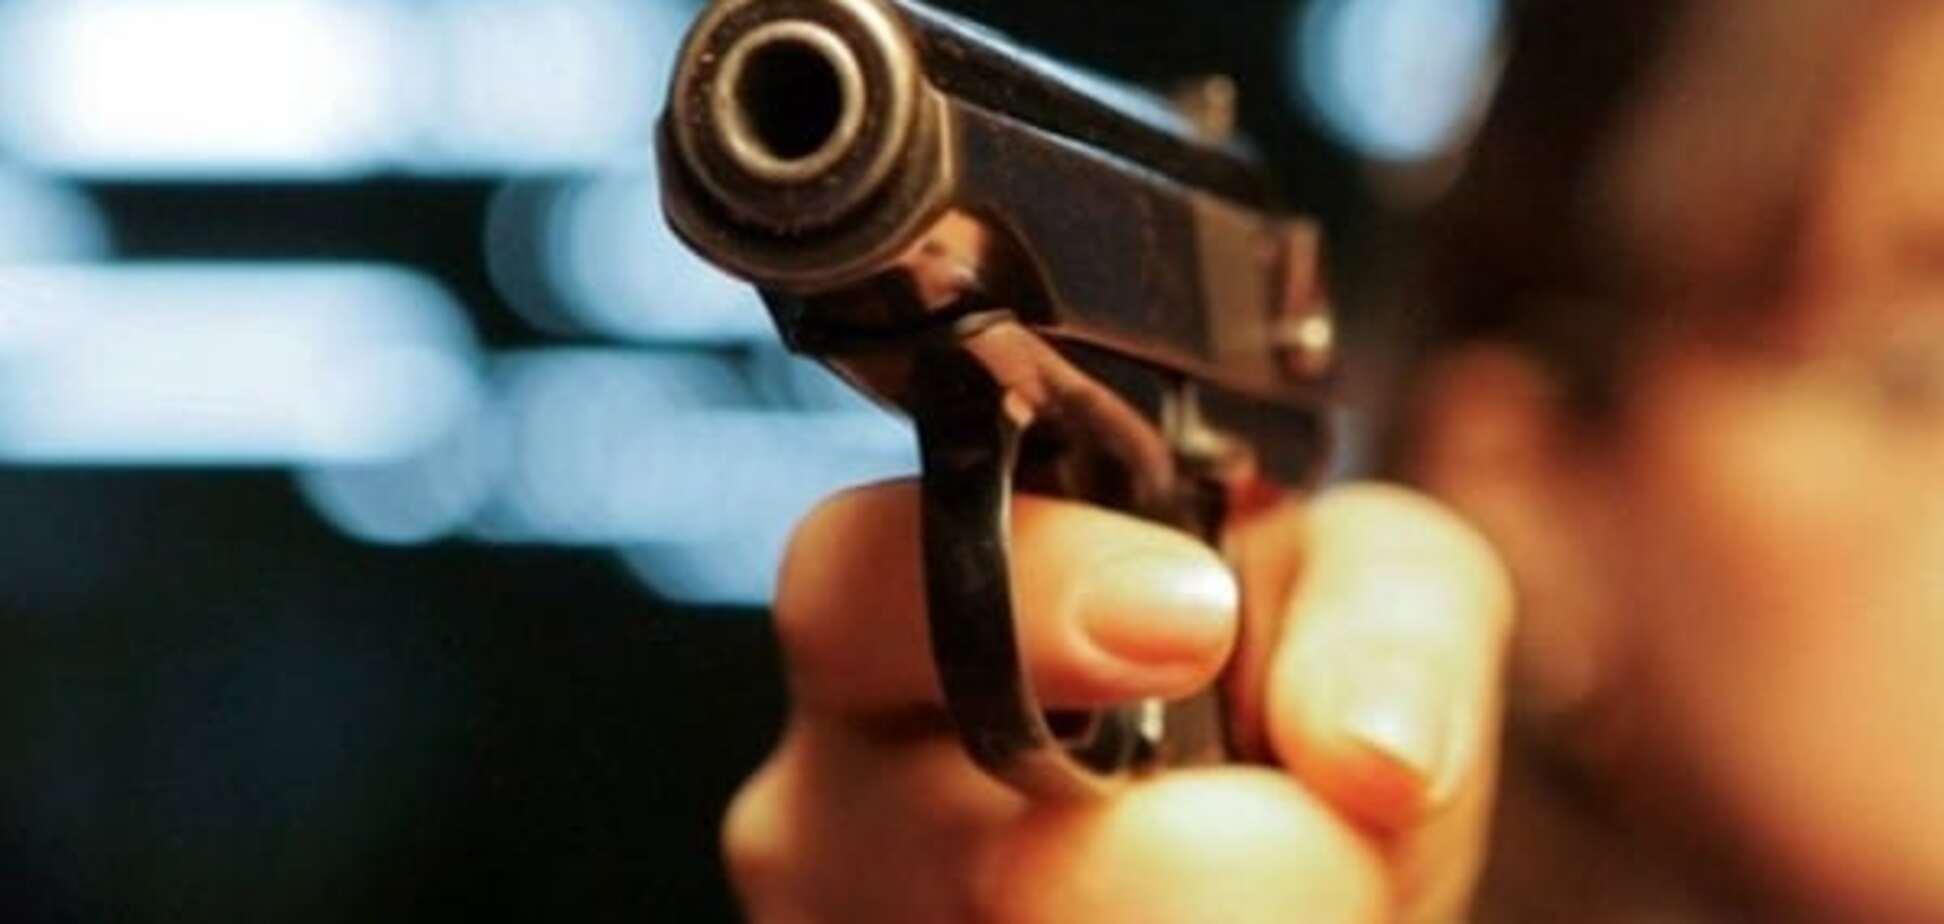 Стрельба пистолет